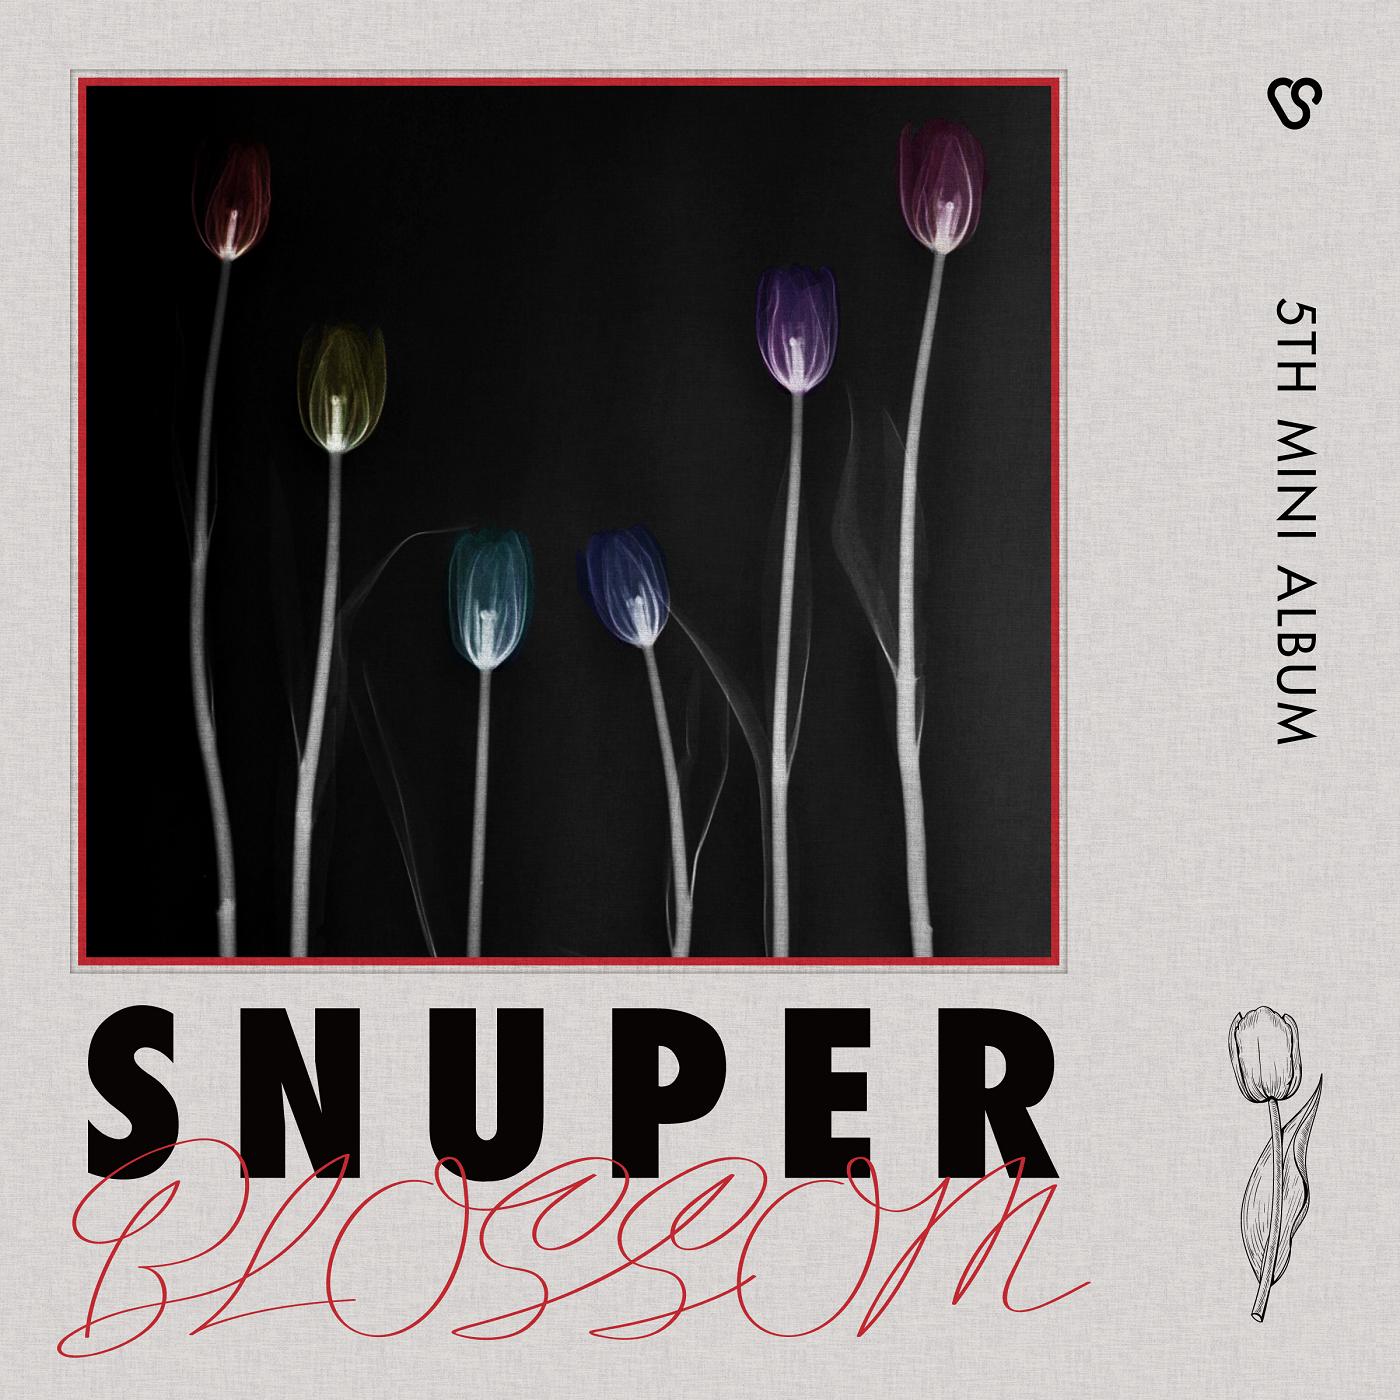 Blossom (SNUPER)